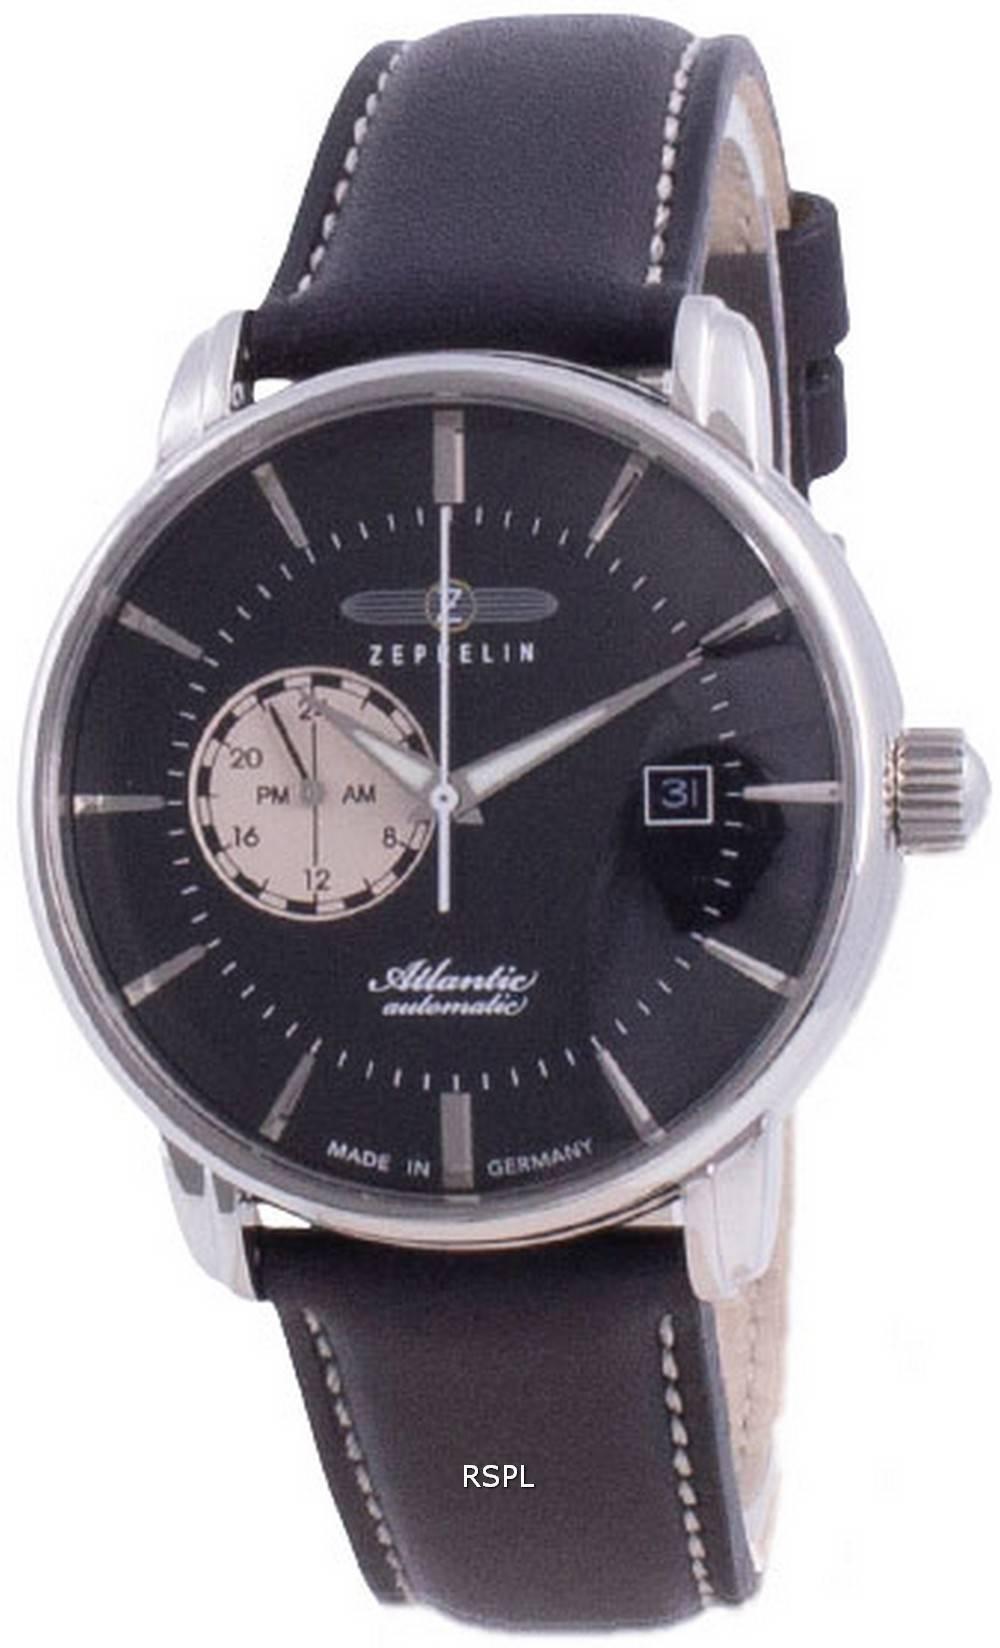 Zeppelin Atlantic Black Dial Automatic 8470-2 84702 miesten kello